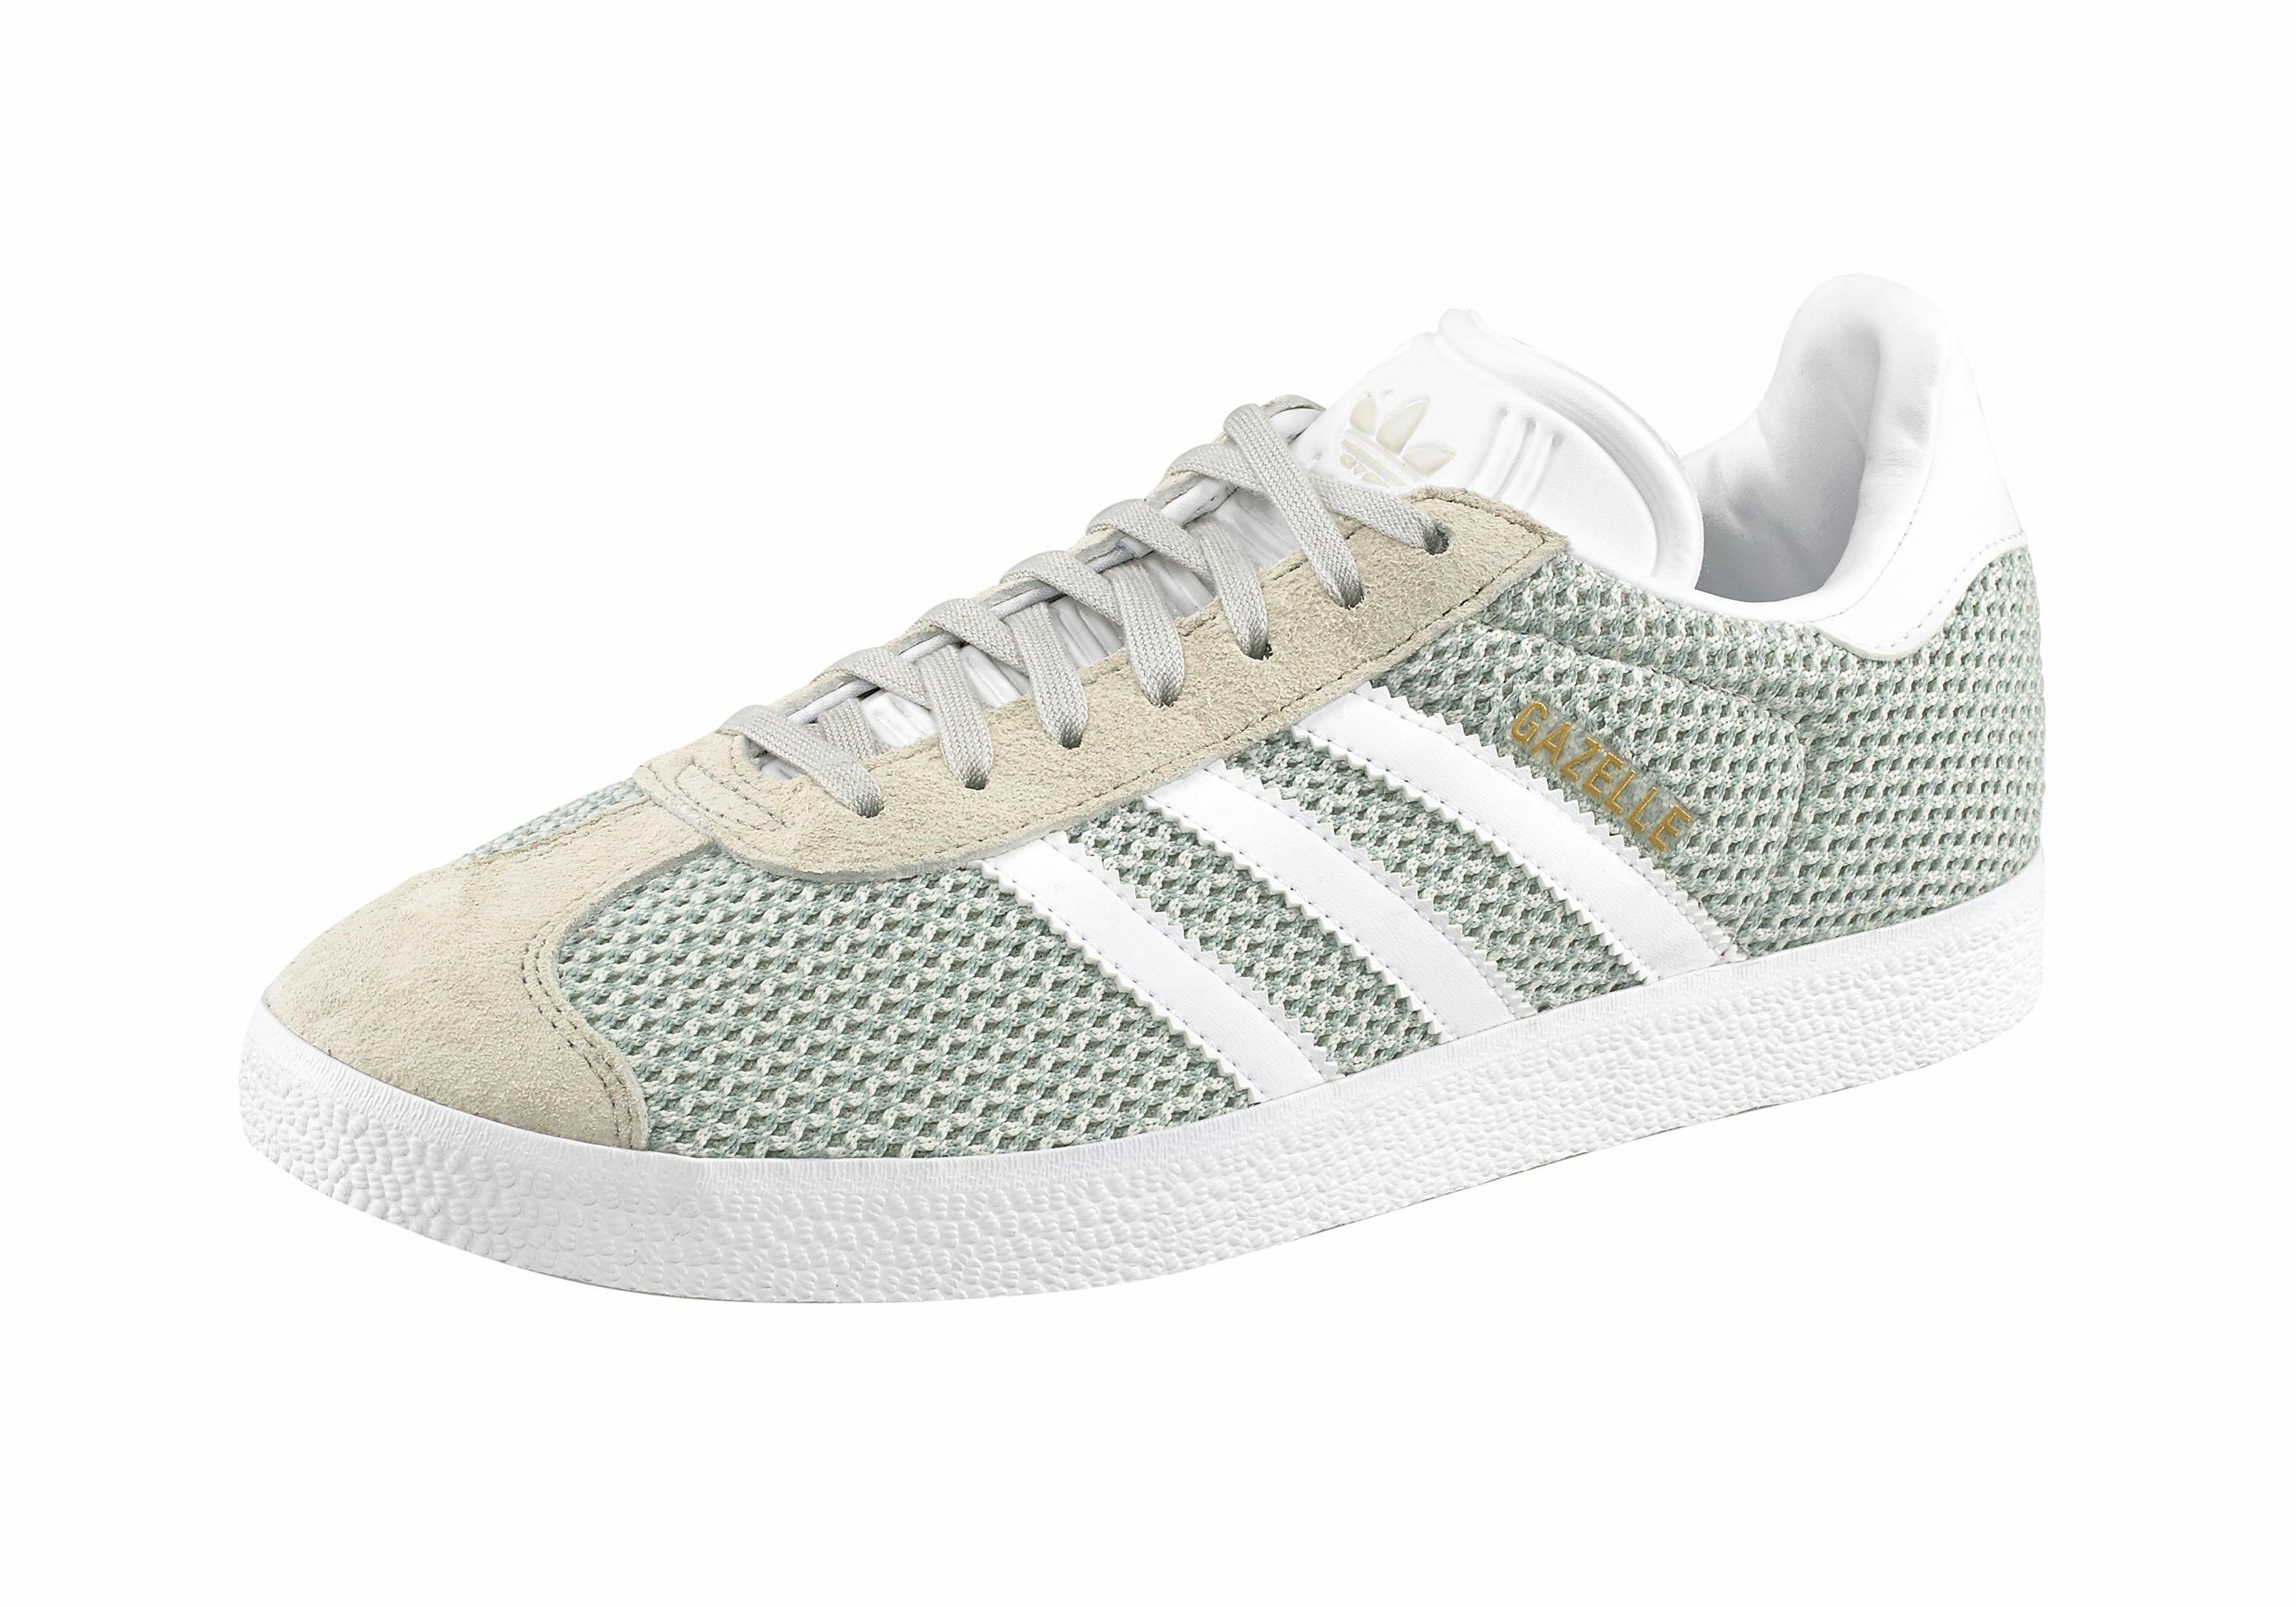 adidas Originals »Gazelle W« - gratis ruilen op otto.nl